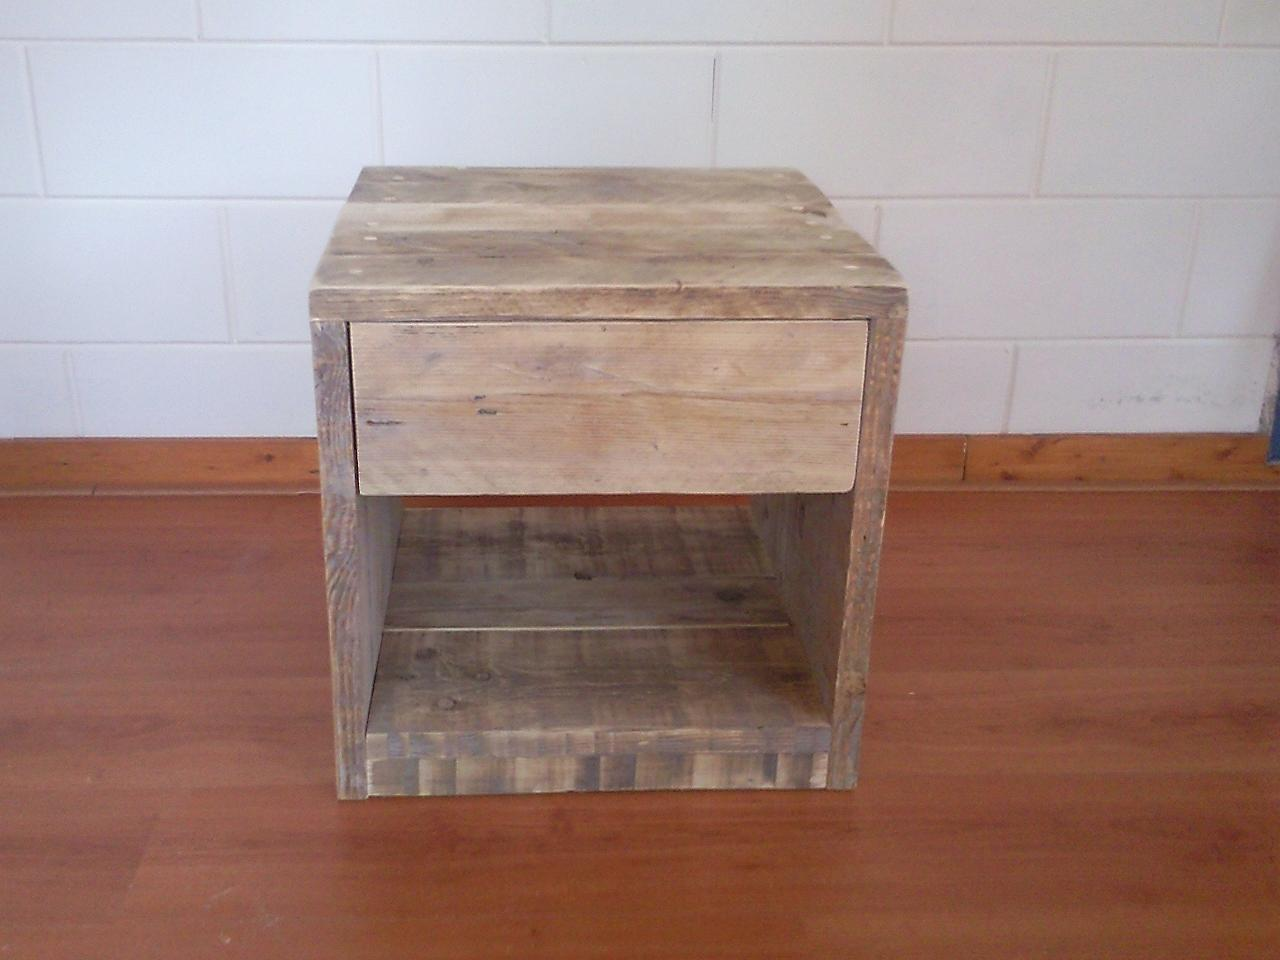 nachtkastje met lade - Wooddesign4u is gespecialiseerd in ...